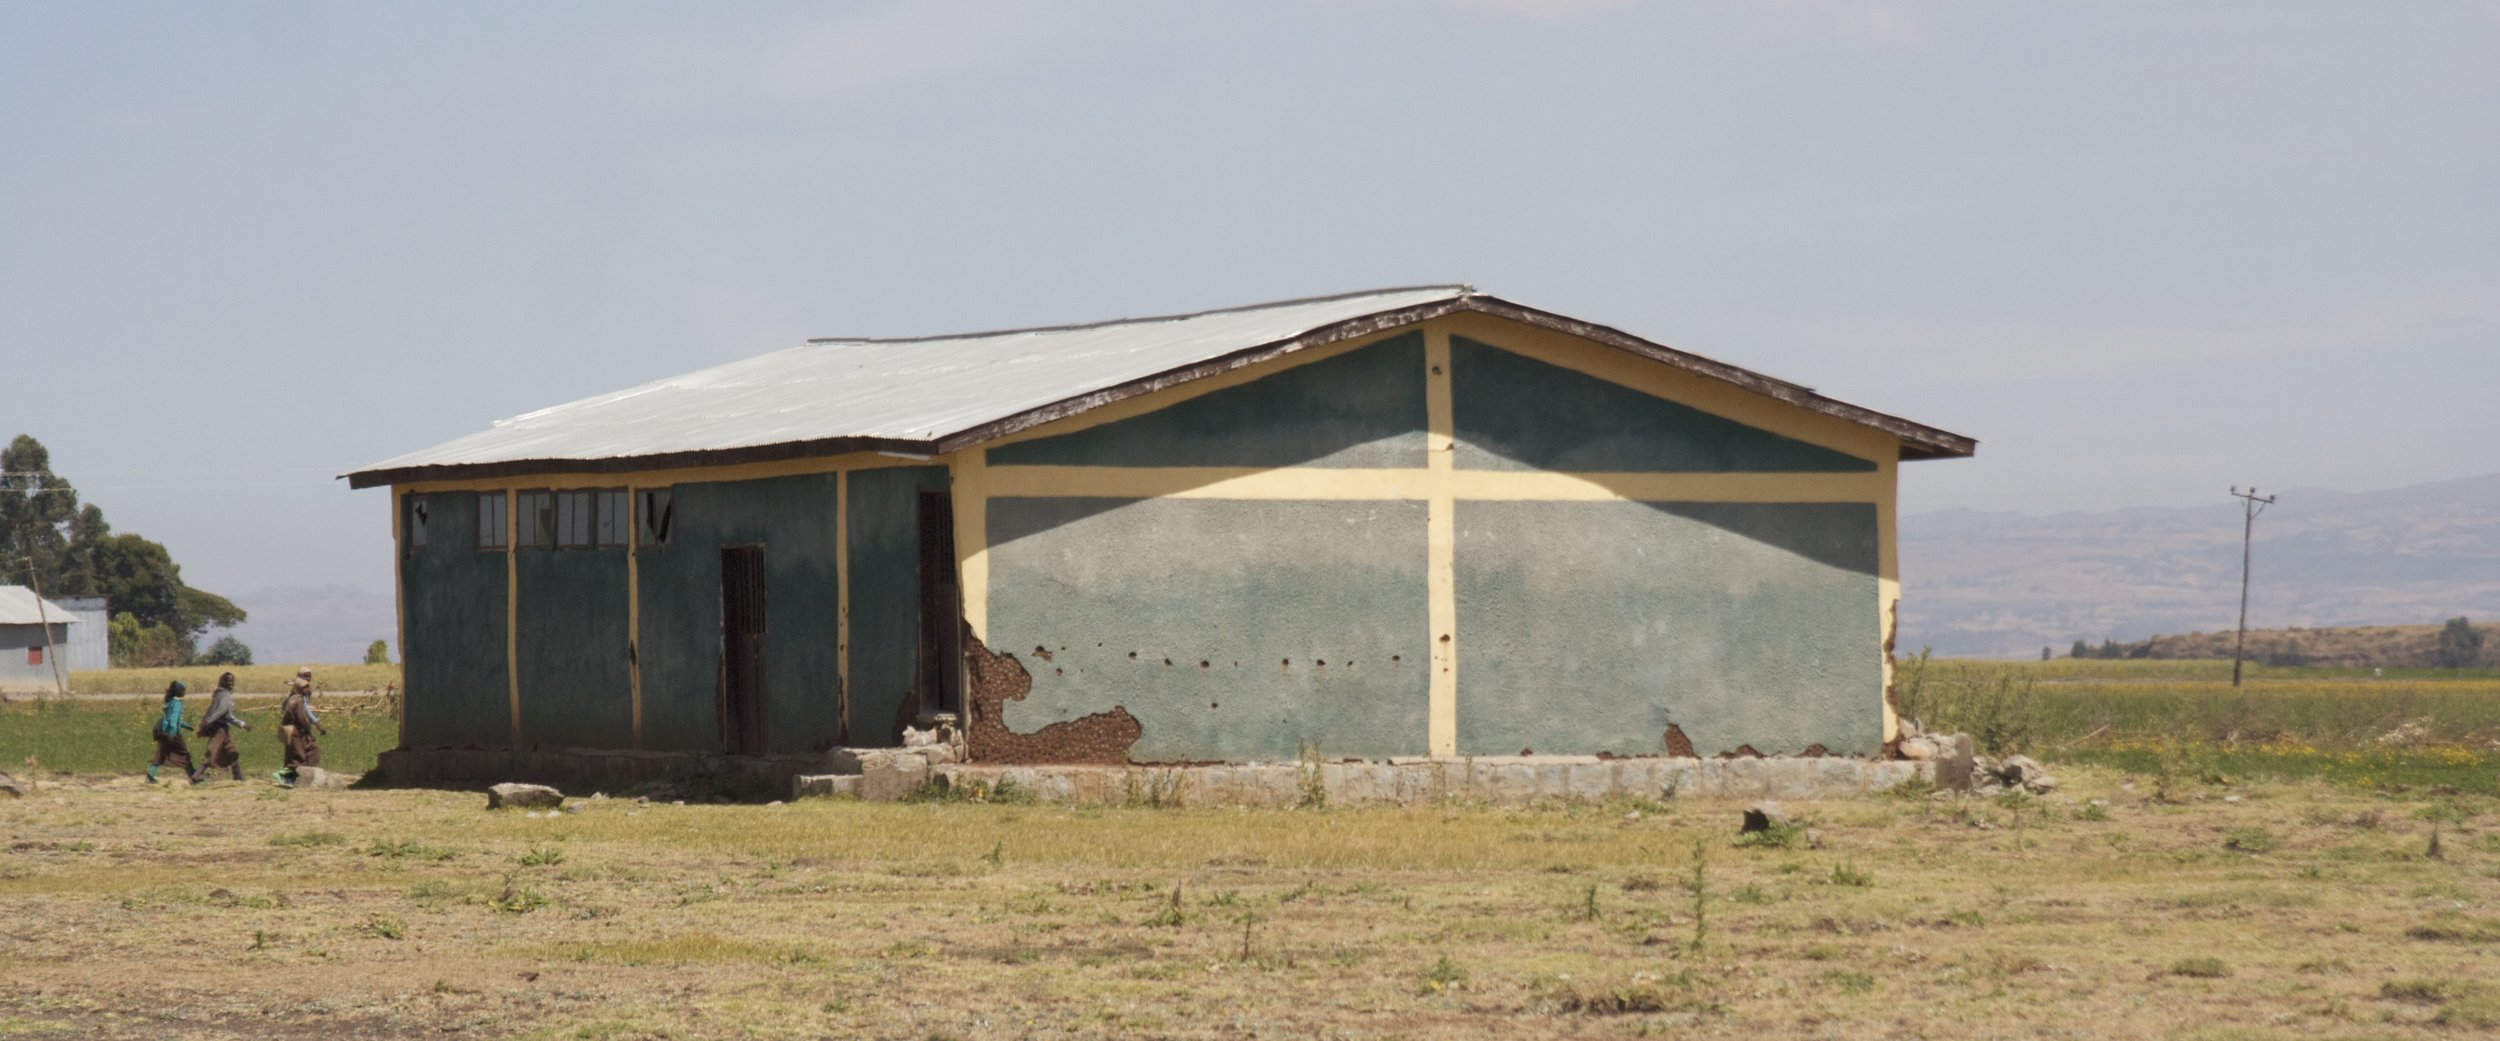 HOLES & YELLOW LINES. AMHARA, ETHIOPIA. NOVEMBER 2016.